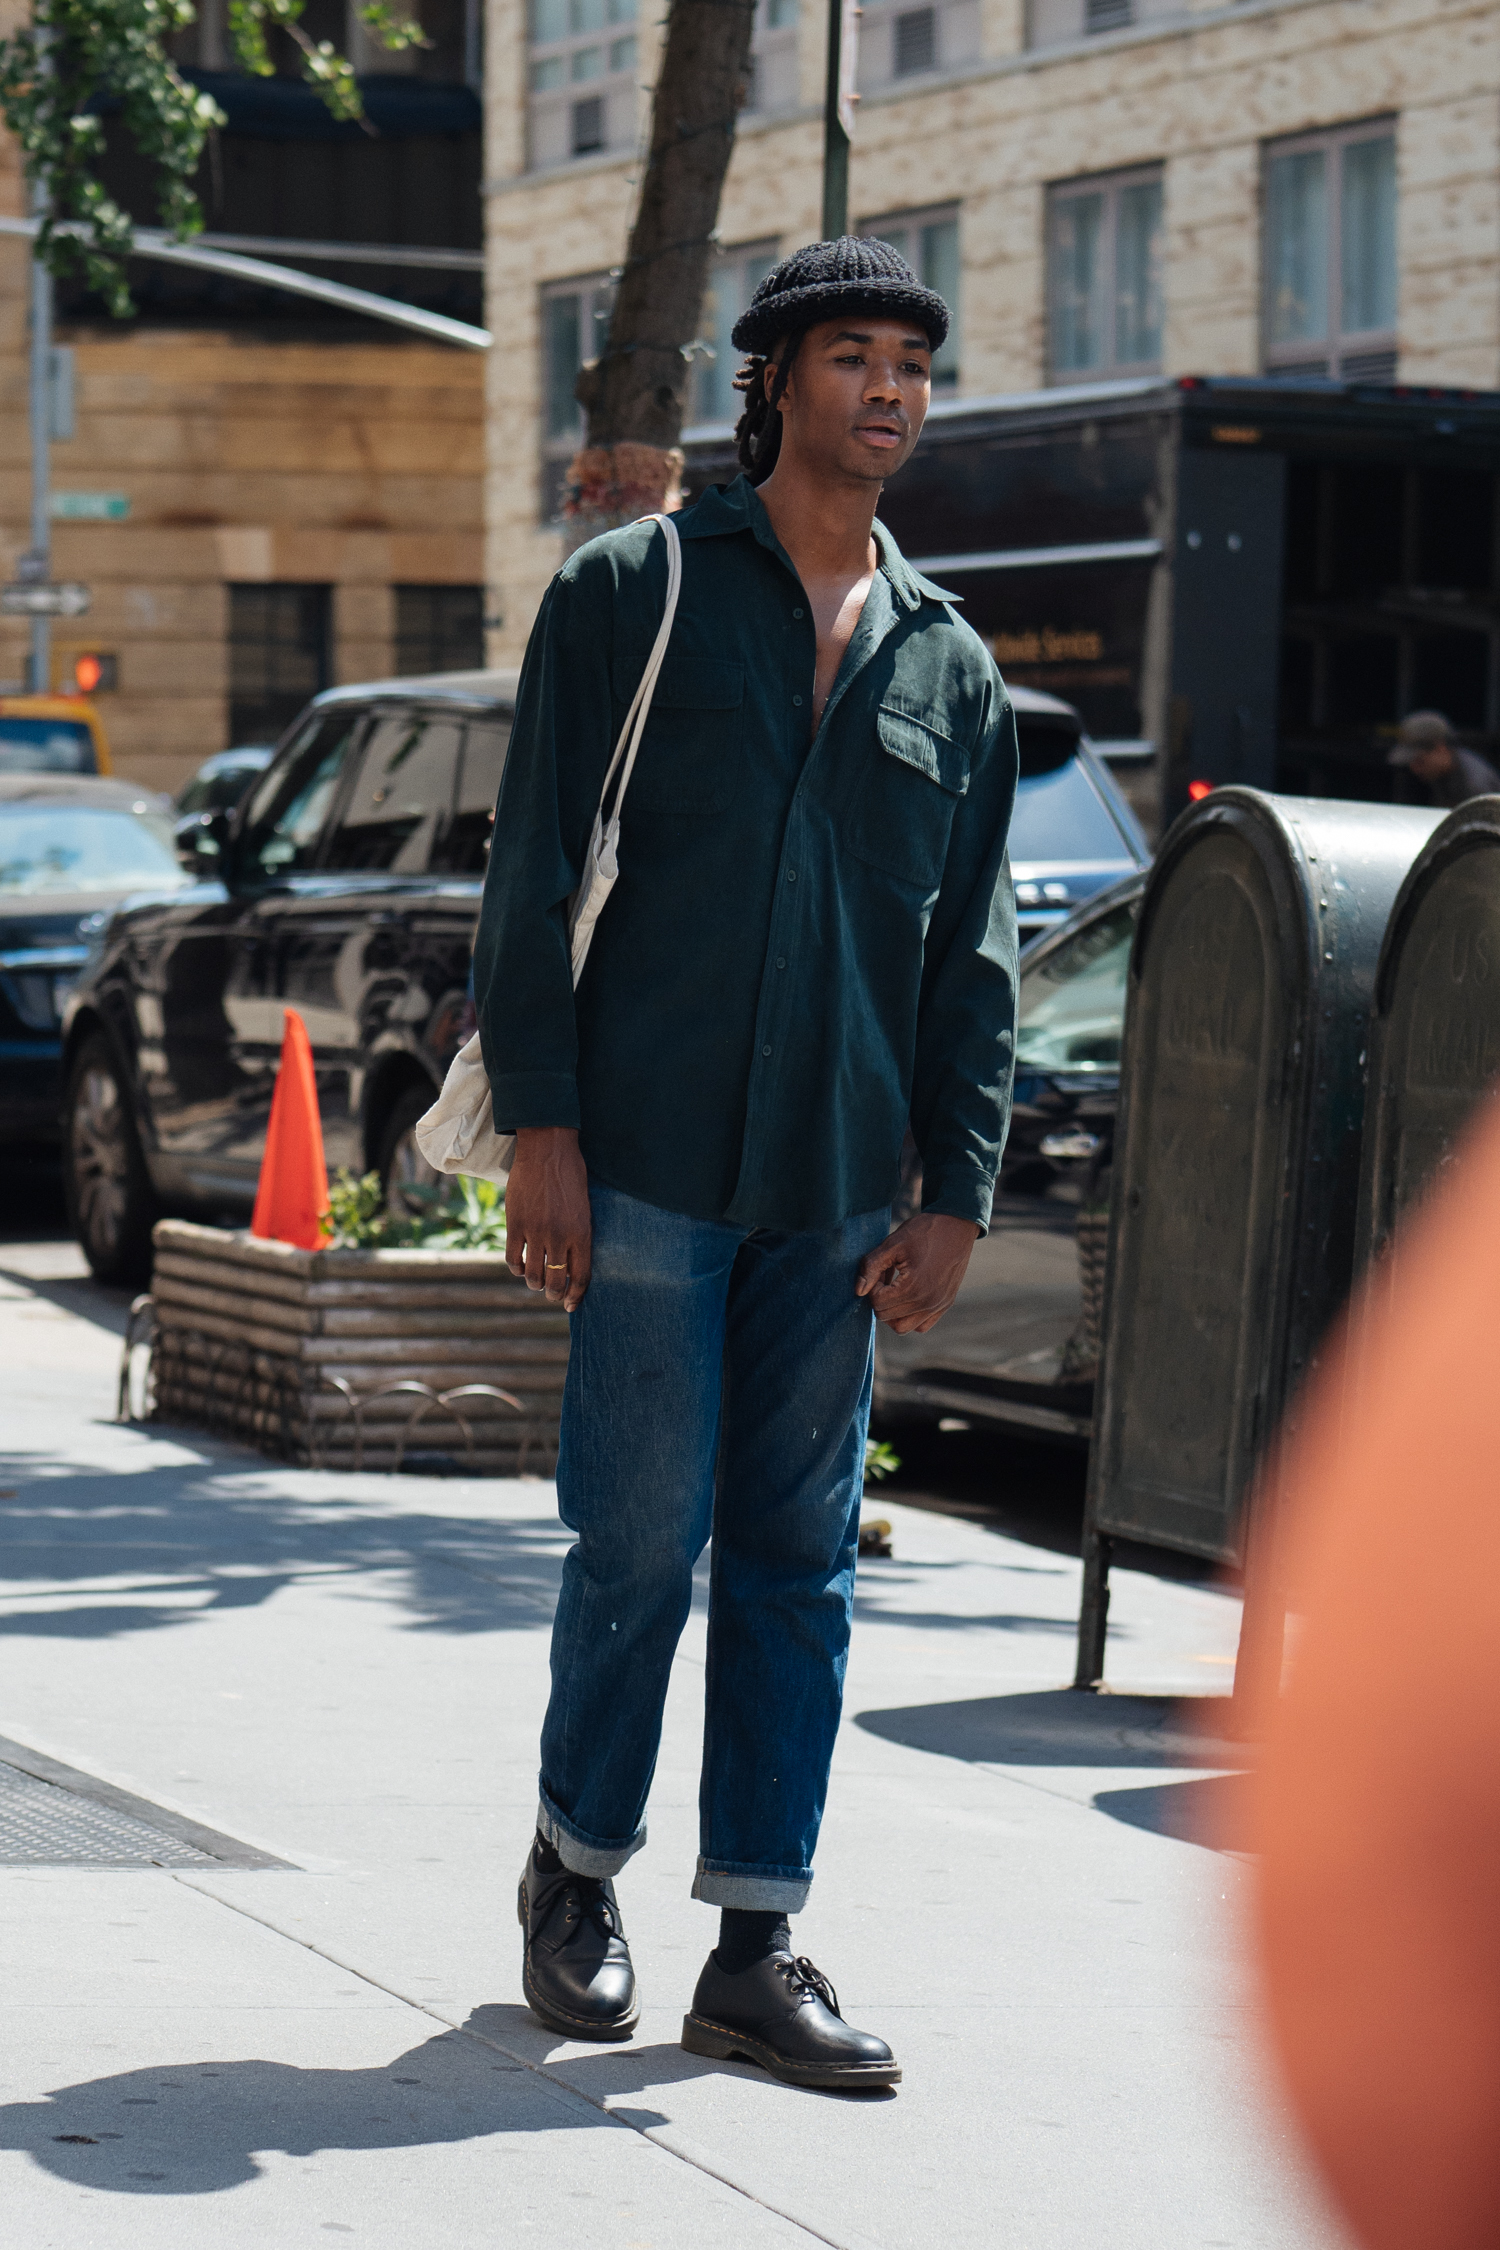 Beanie at  New York Fashion Week: Men's . Captured on my  Olympus OM-D E-M1 II with a  M.ZUIKO PRO 45mm F1.2 lens.